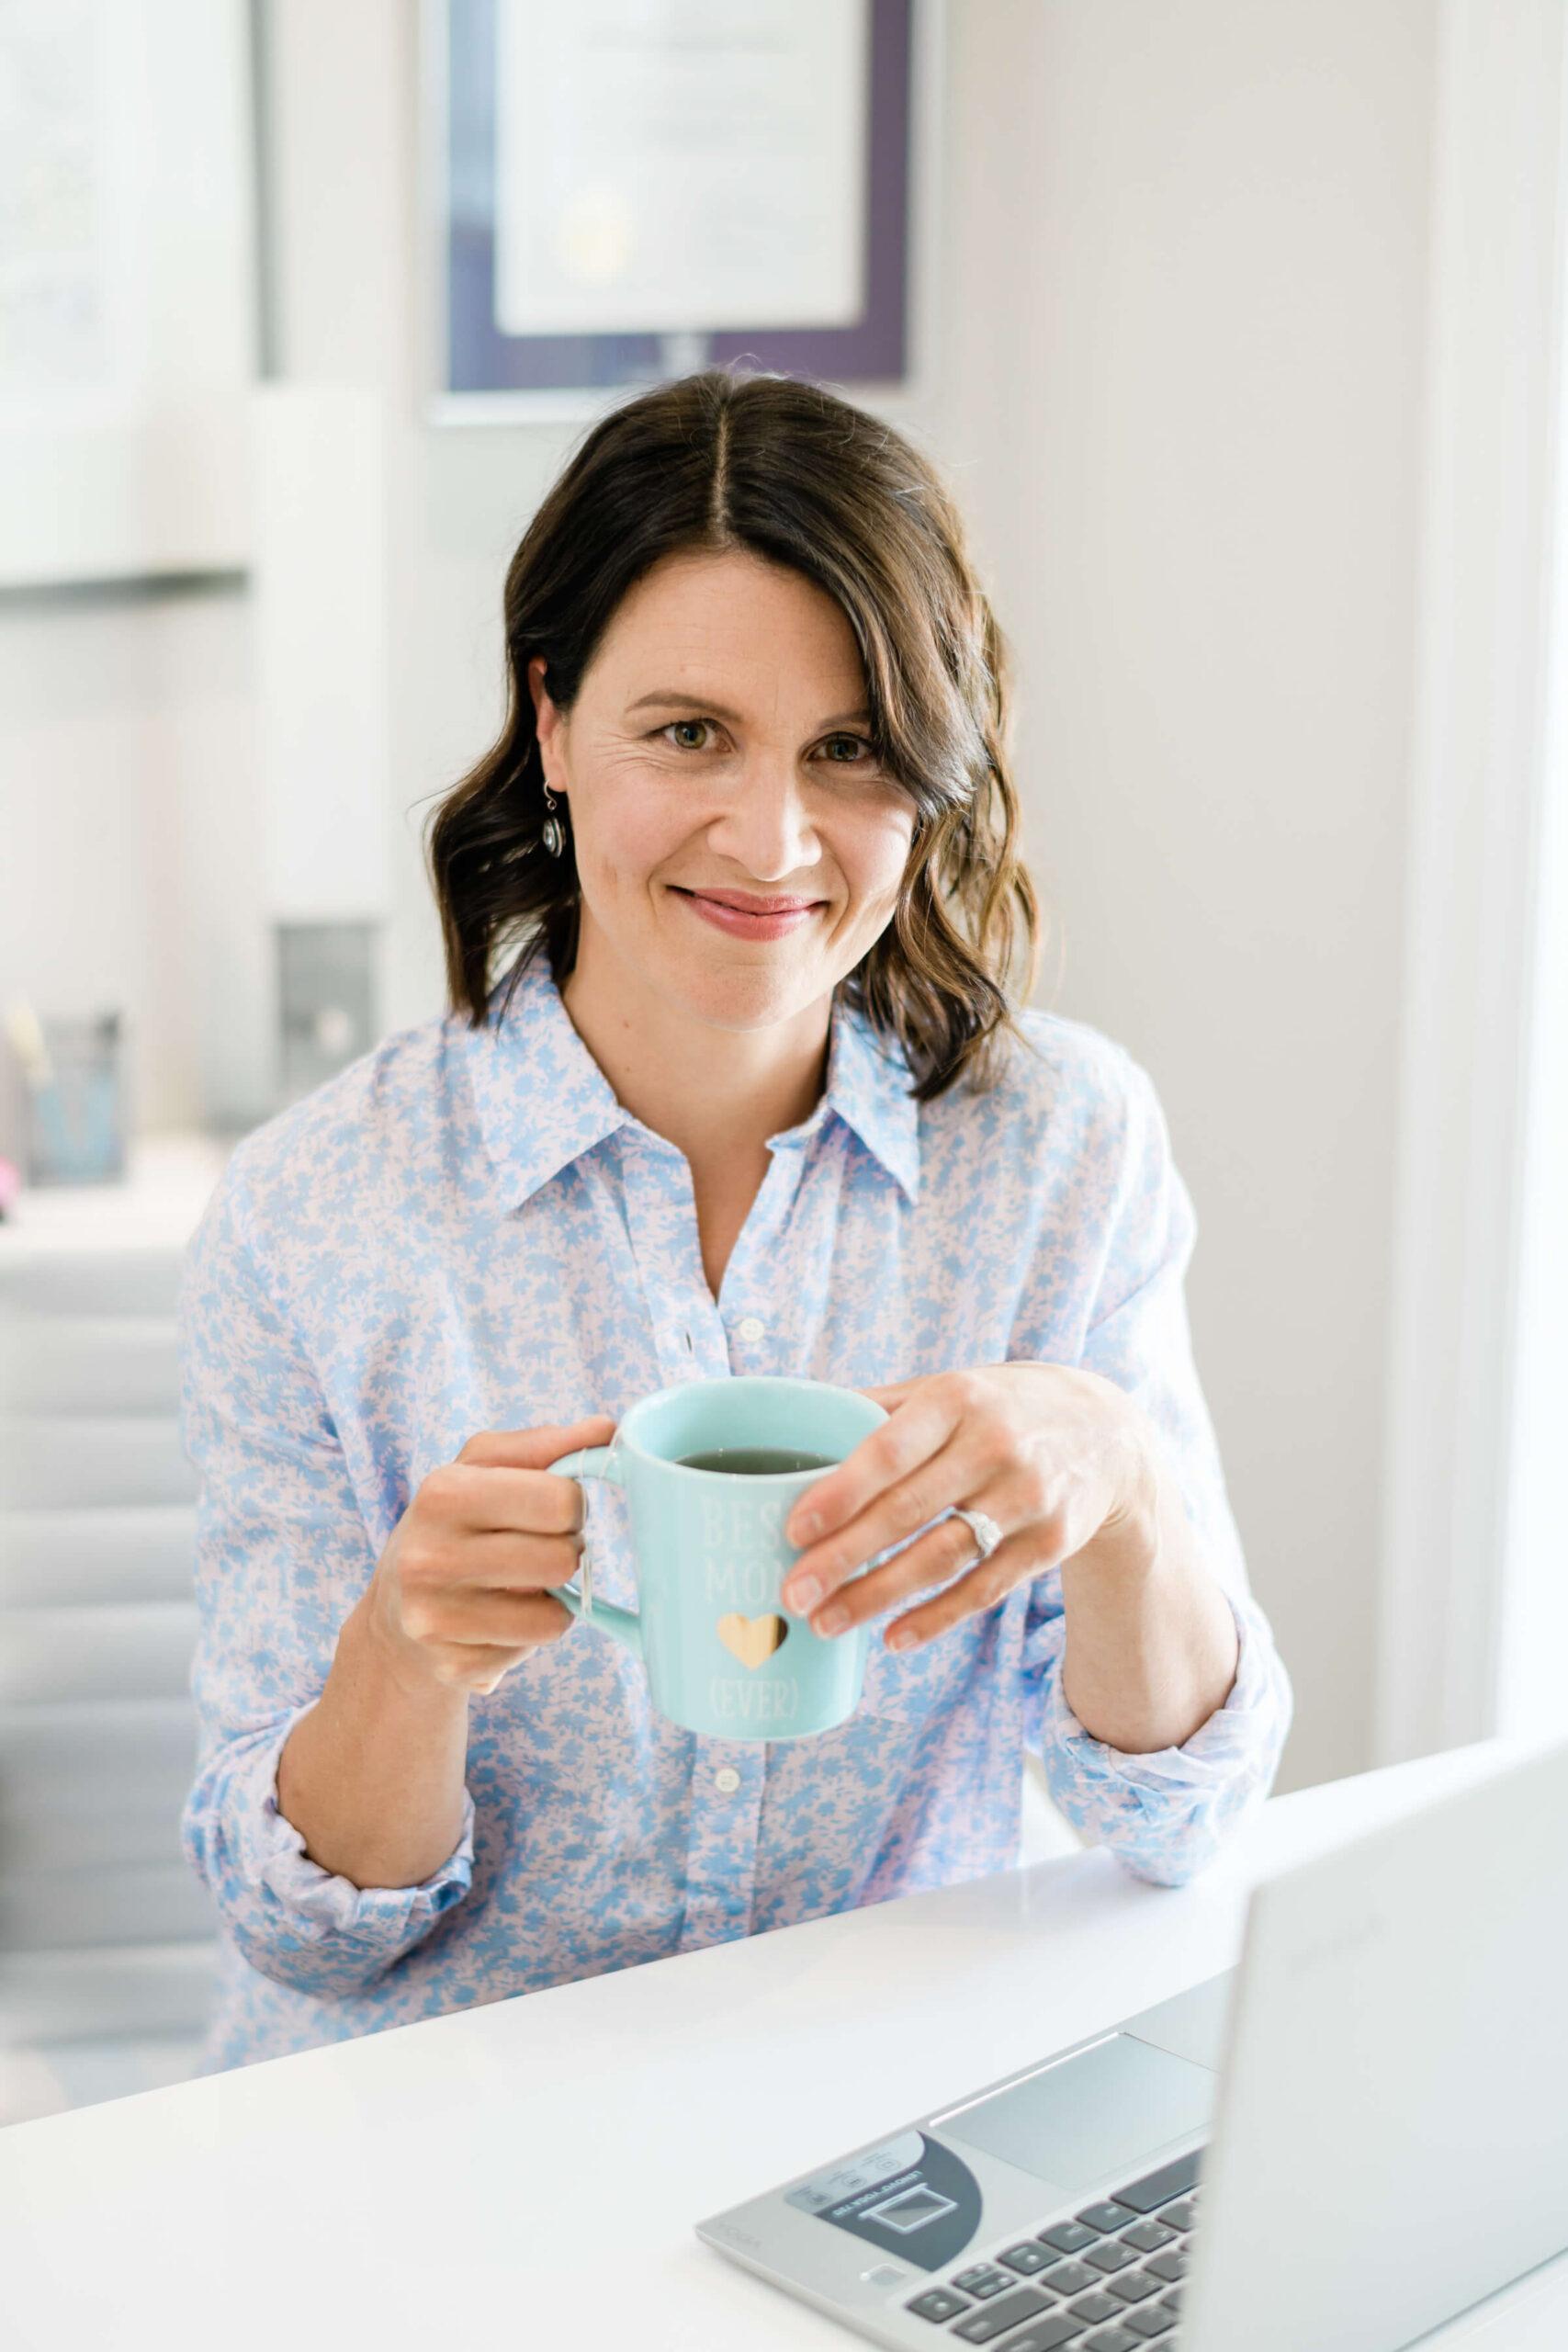 Katie holding a mug of coffee